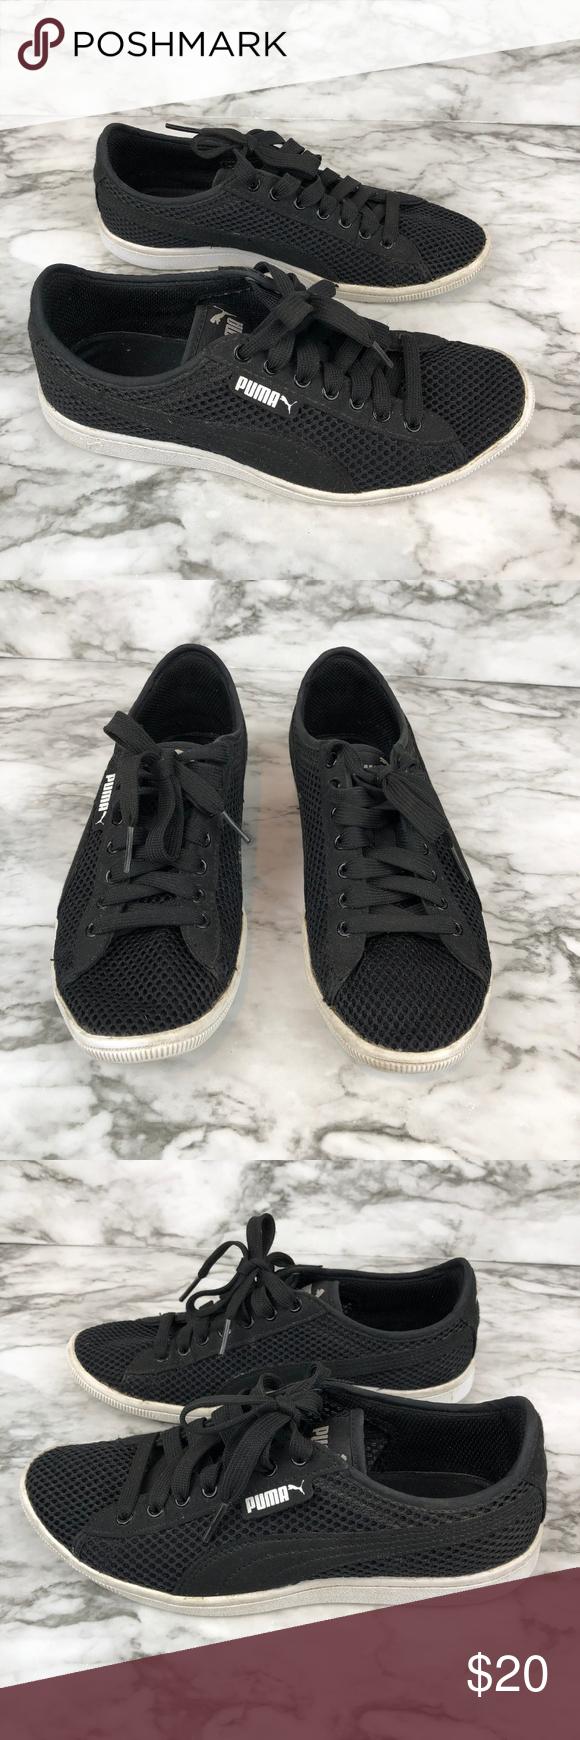 34c009c707c I just added this listing on Poshmark  Puma Black Memory Foam Sneakers Size  6.  shopmycloset  poshmark  fashion  shopping  style  forsale  Puma  Shoes